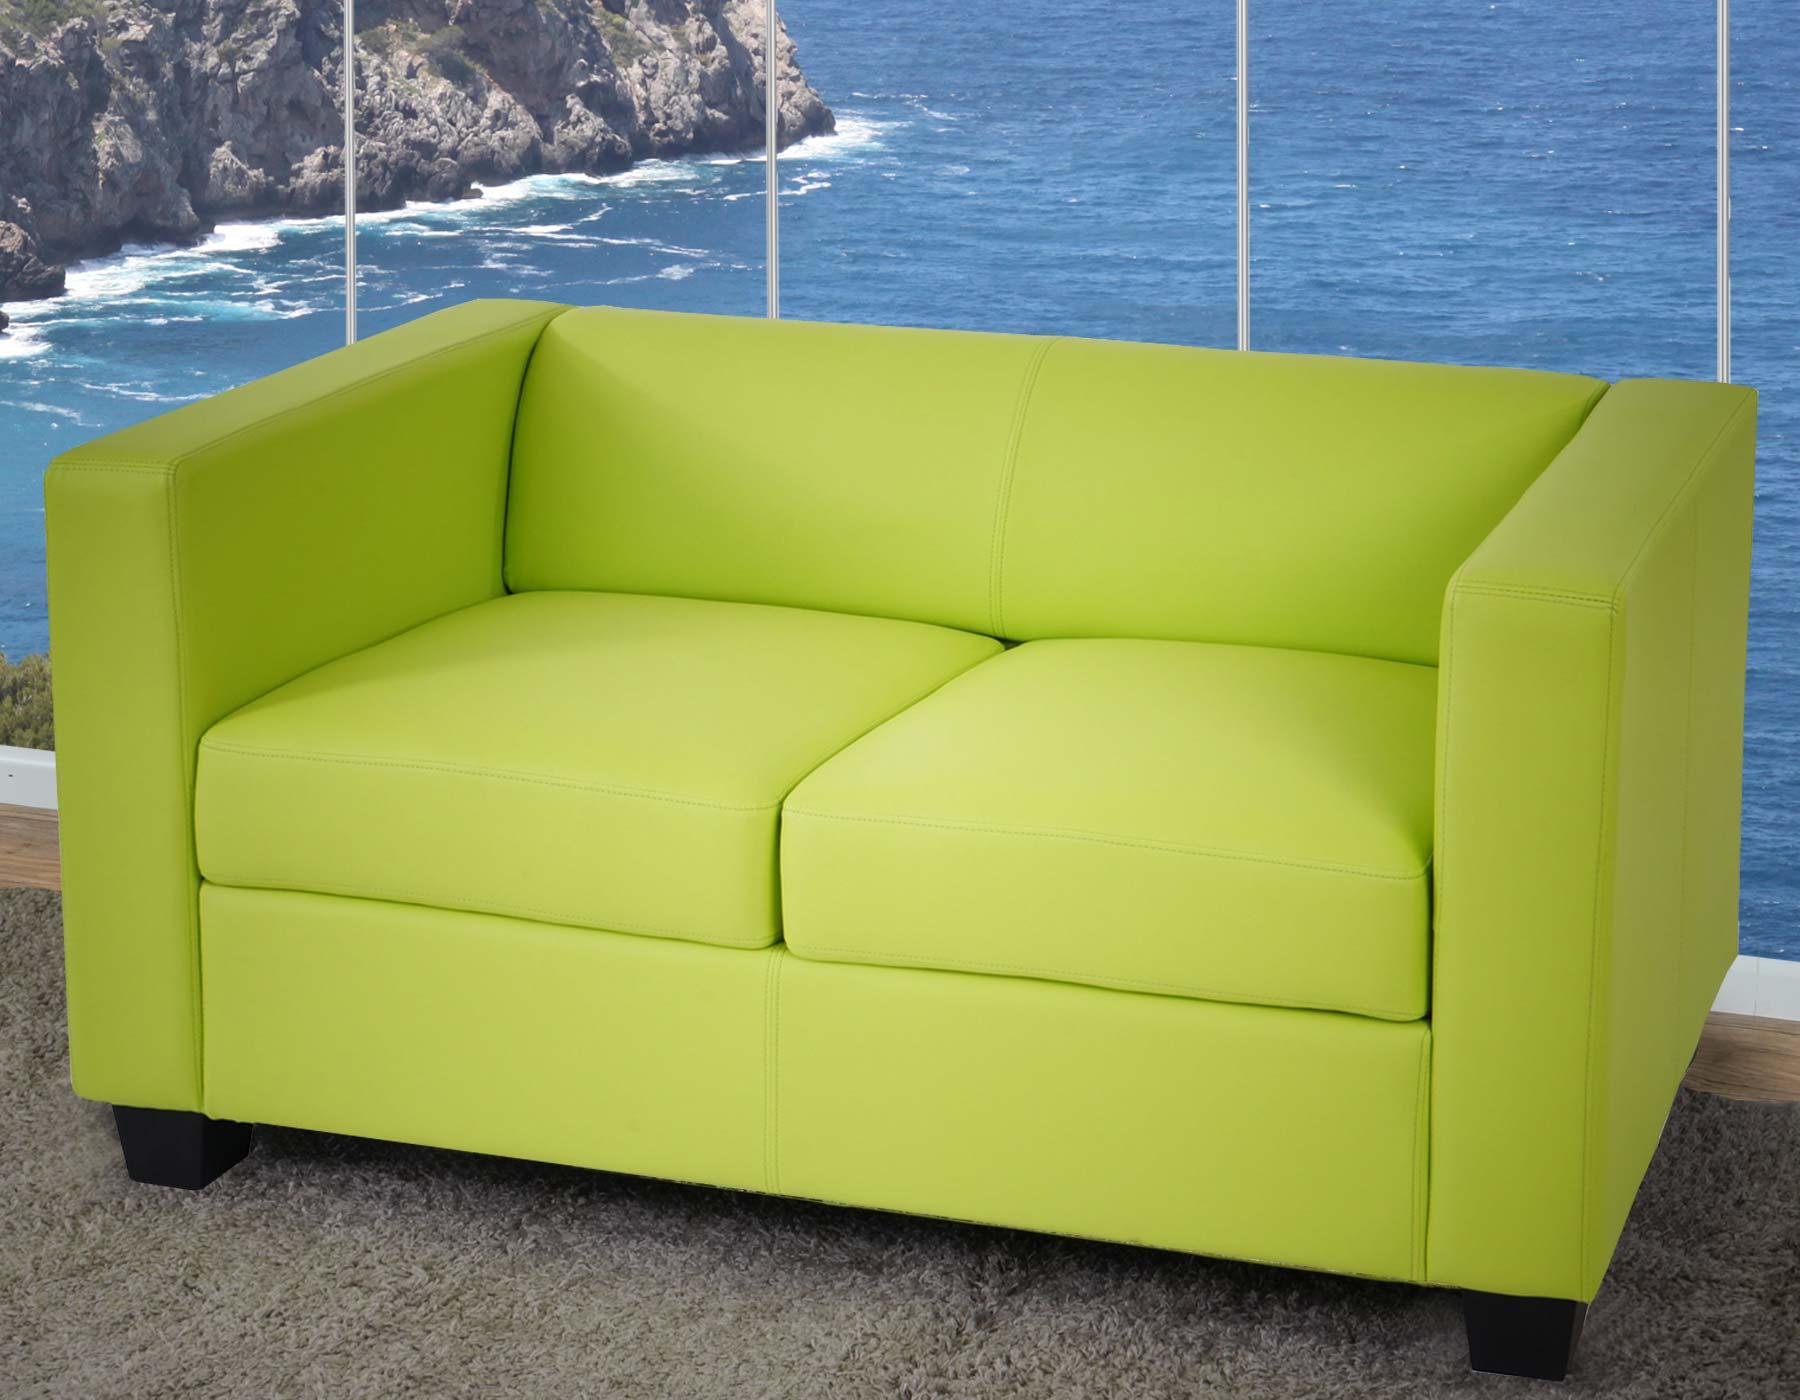 serie lille m65 divano sofa 2 posti 75x137x70cm ecopelle. Black Bedroom Furniture Sets. Home Design Ideas